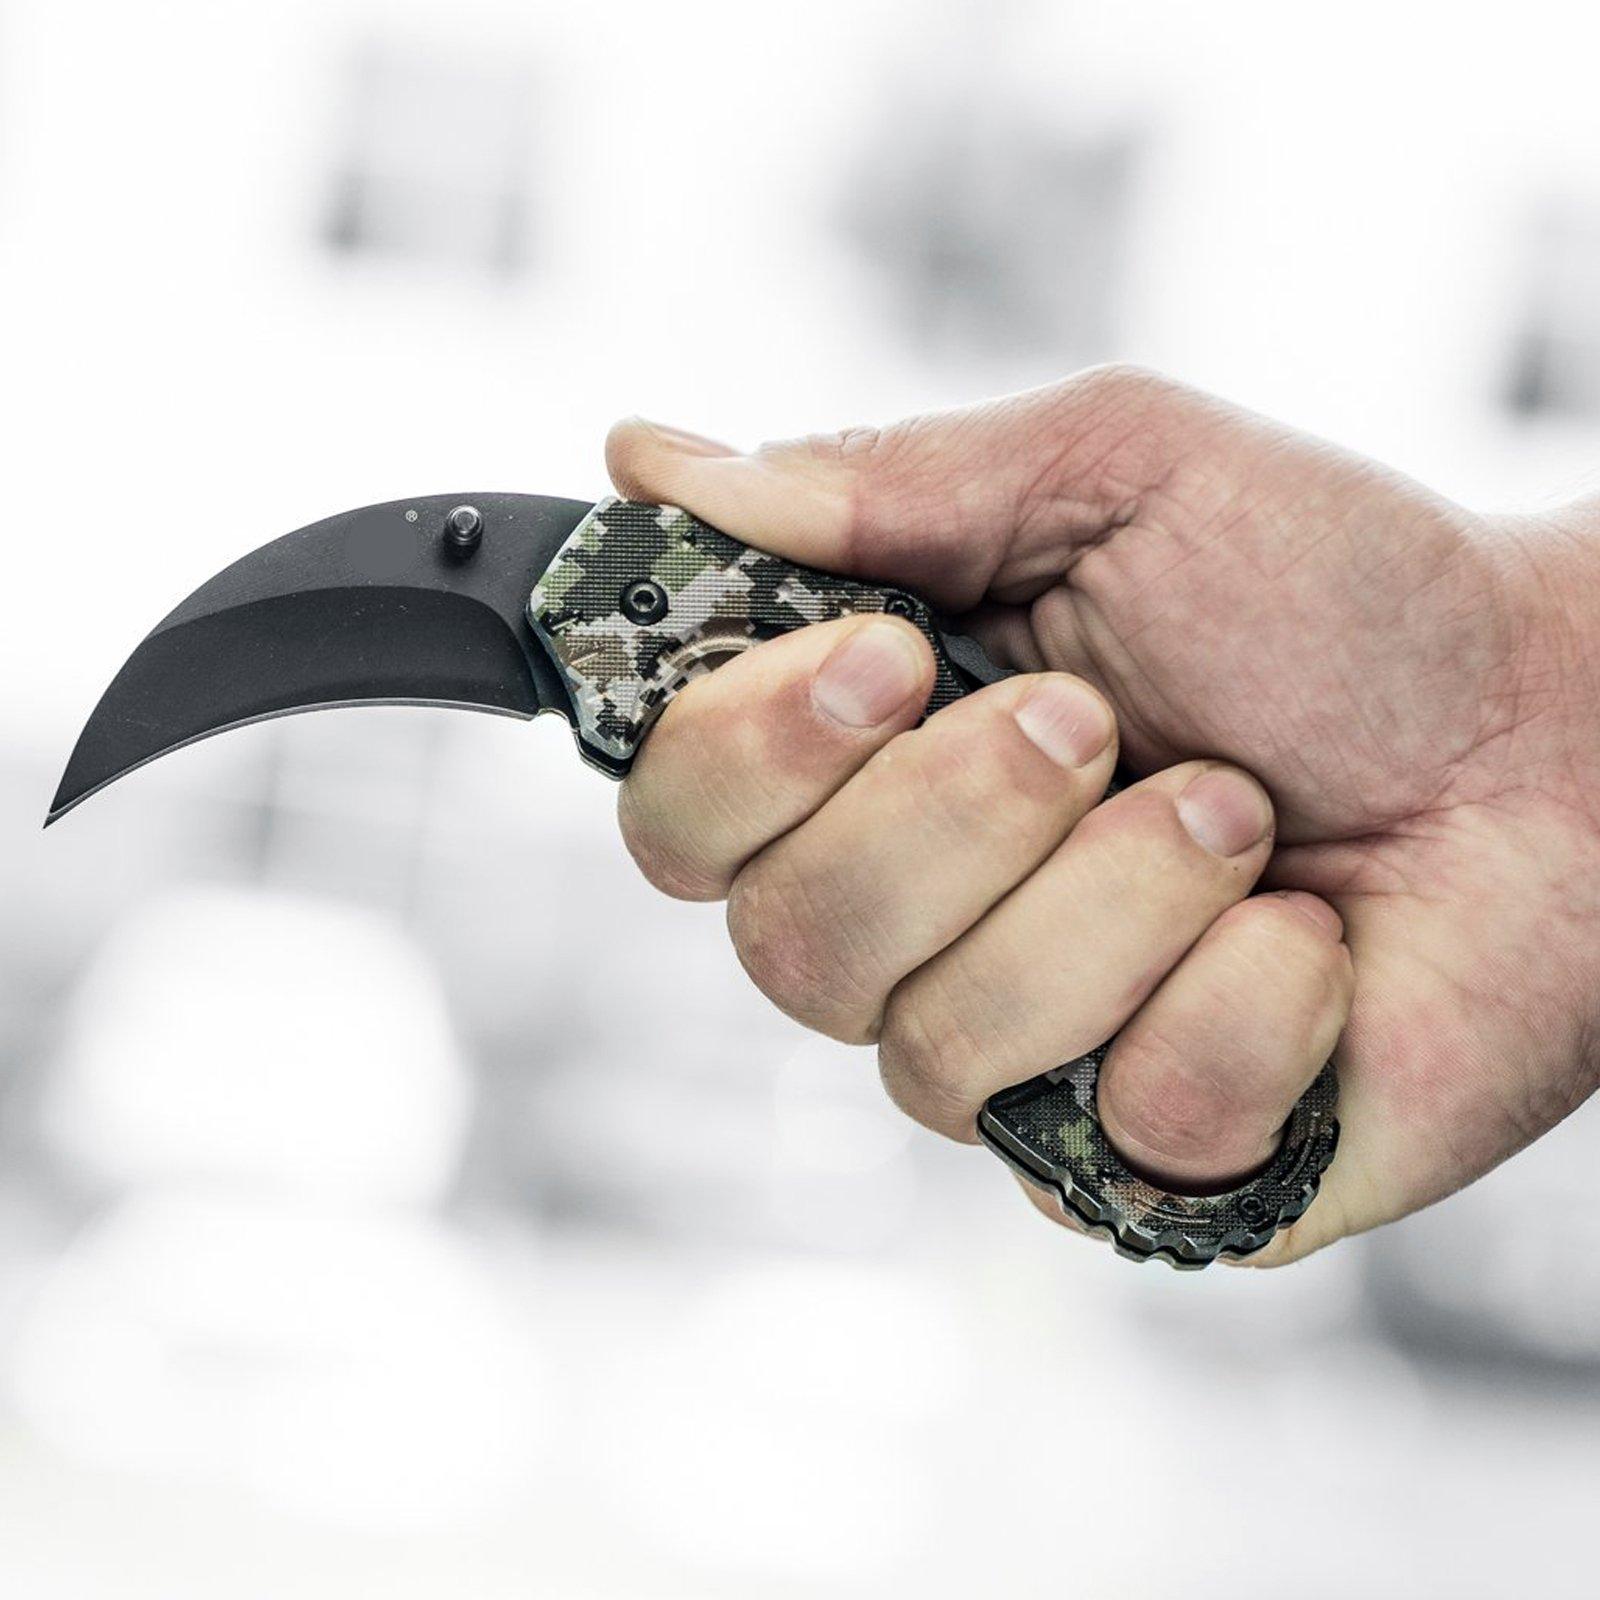 ASR-Outdoor-Hawkbill-Style-Folding-Knife-Digital-Camo-Pocket-Blade-4-Colors miniature 8